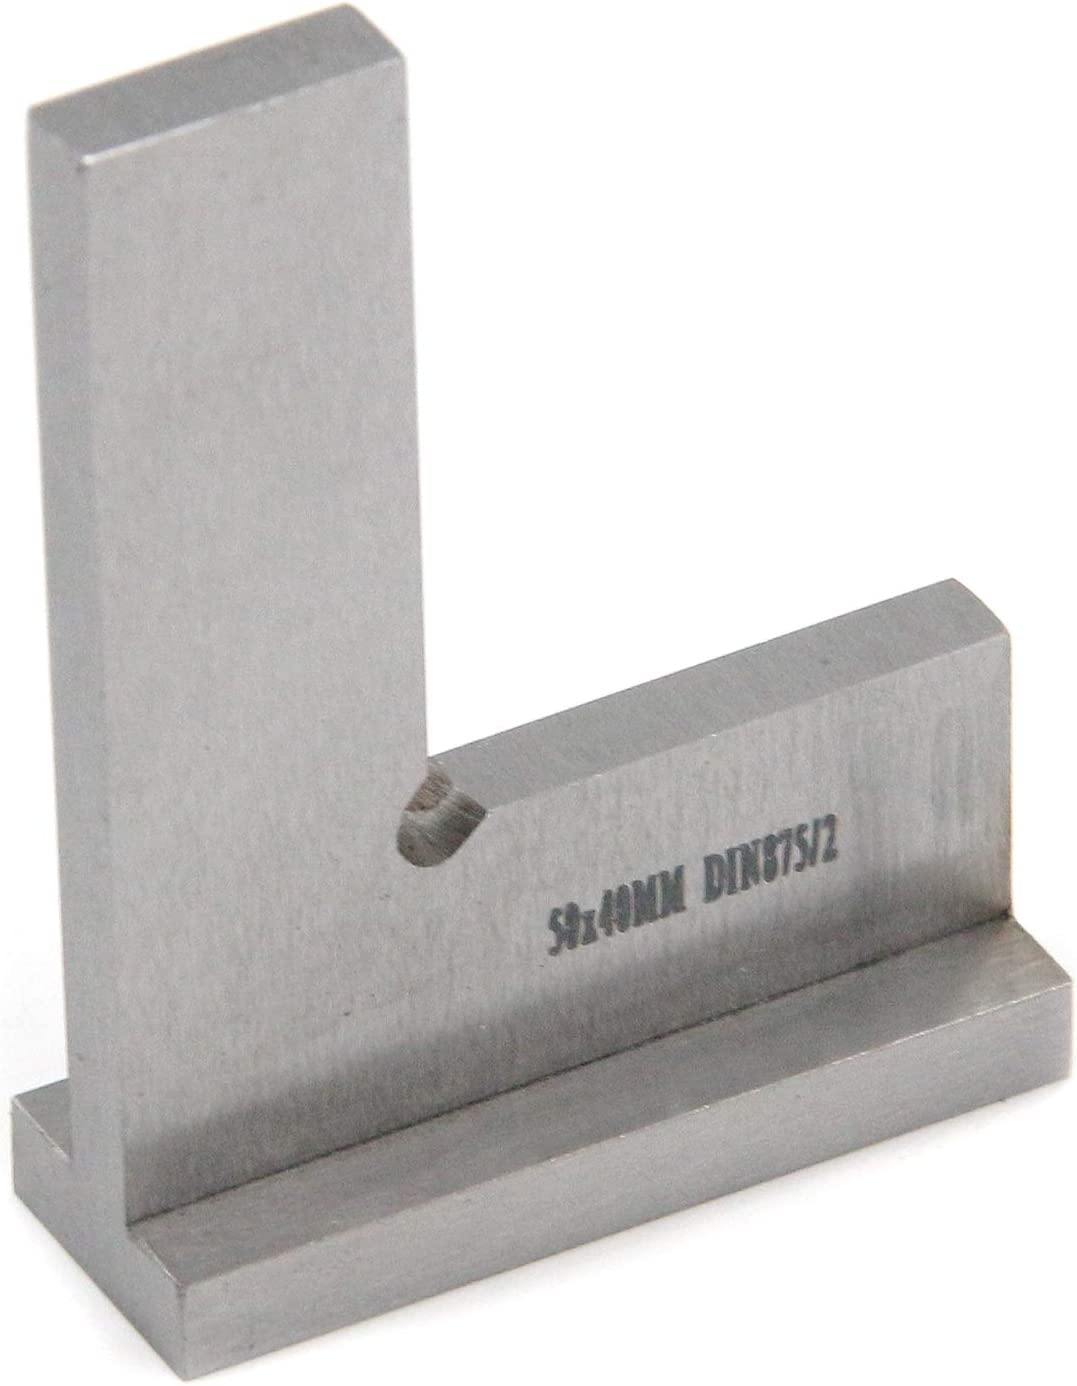 Tulead Machinist Square Precision Square Woodworking Square Right Angle Engineer Square 50x40mm/2